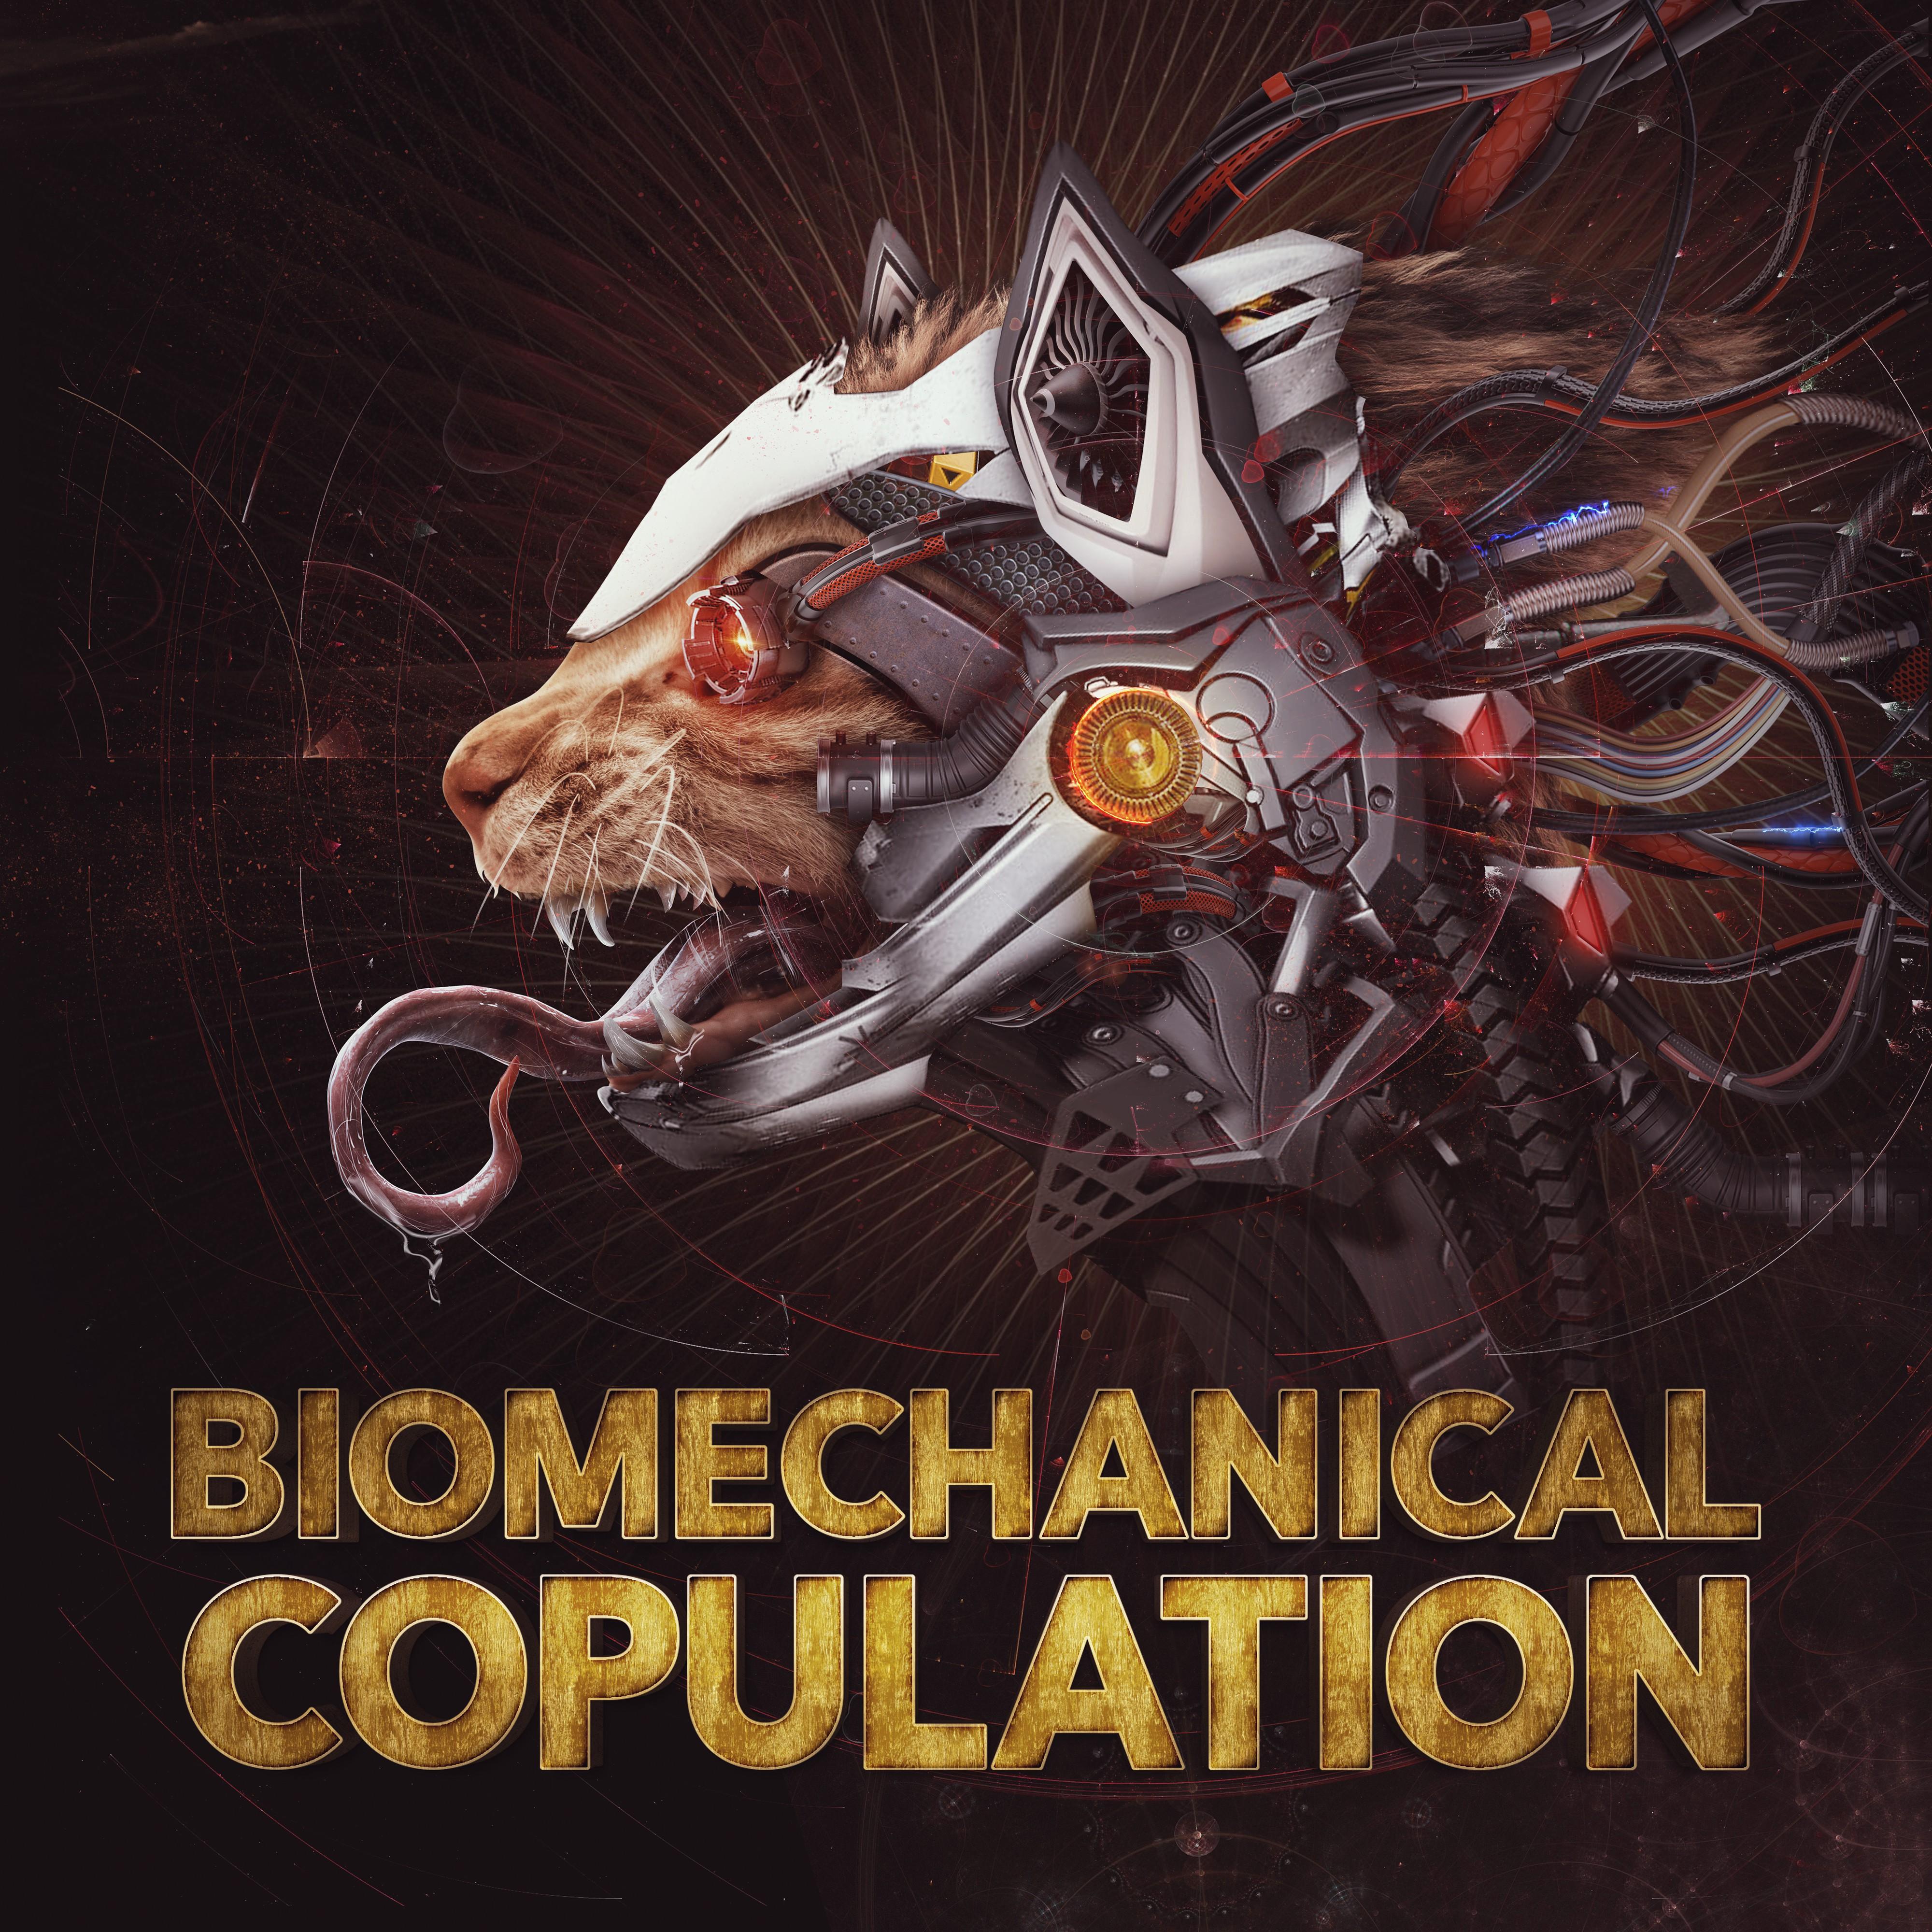 Ninja Kitty - Biomechanical Copulation